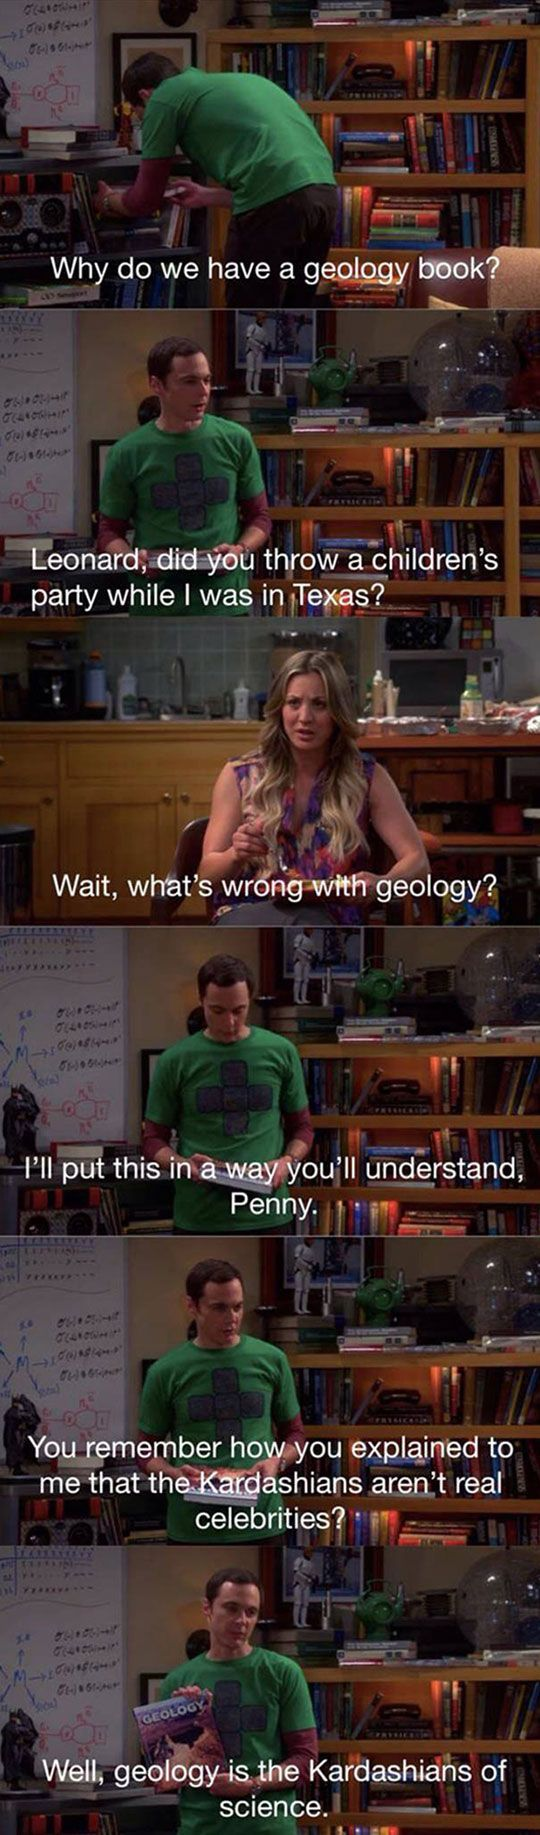 Geology And The Kardashians. Big Bang Theory. LOL Sheldon.